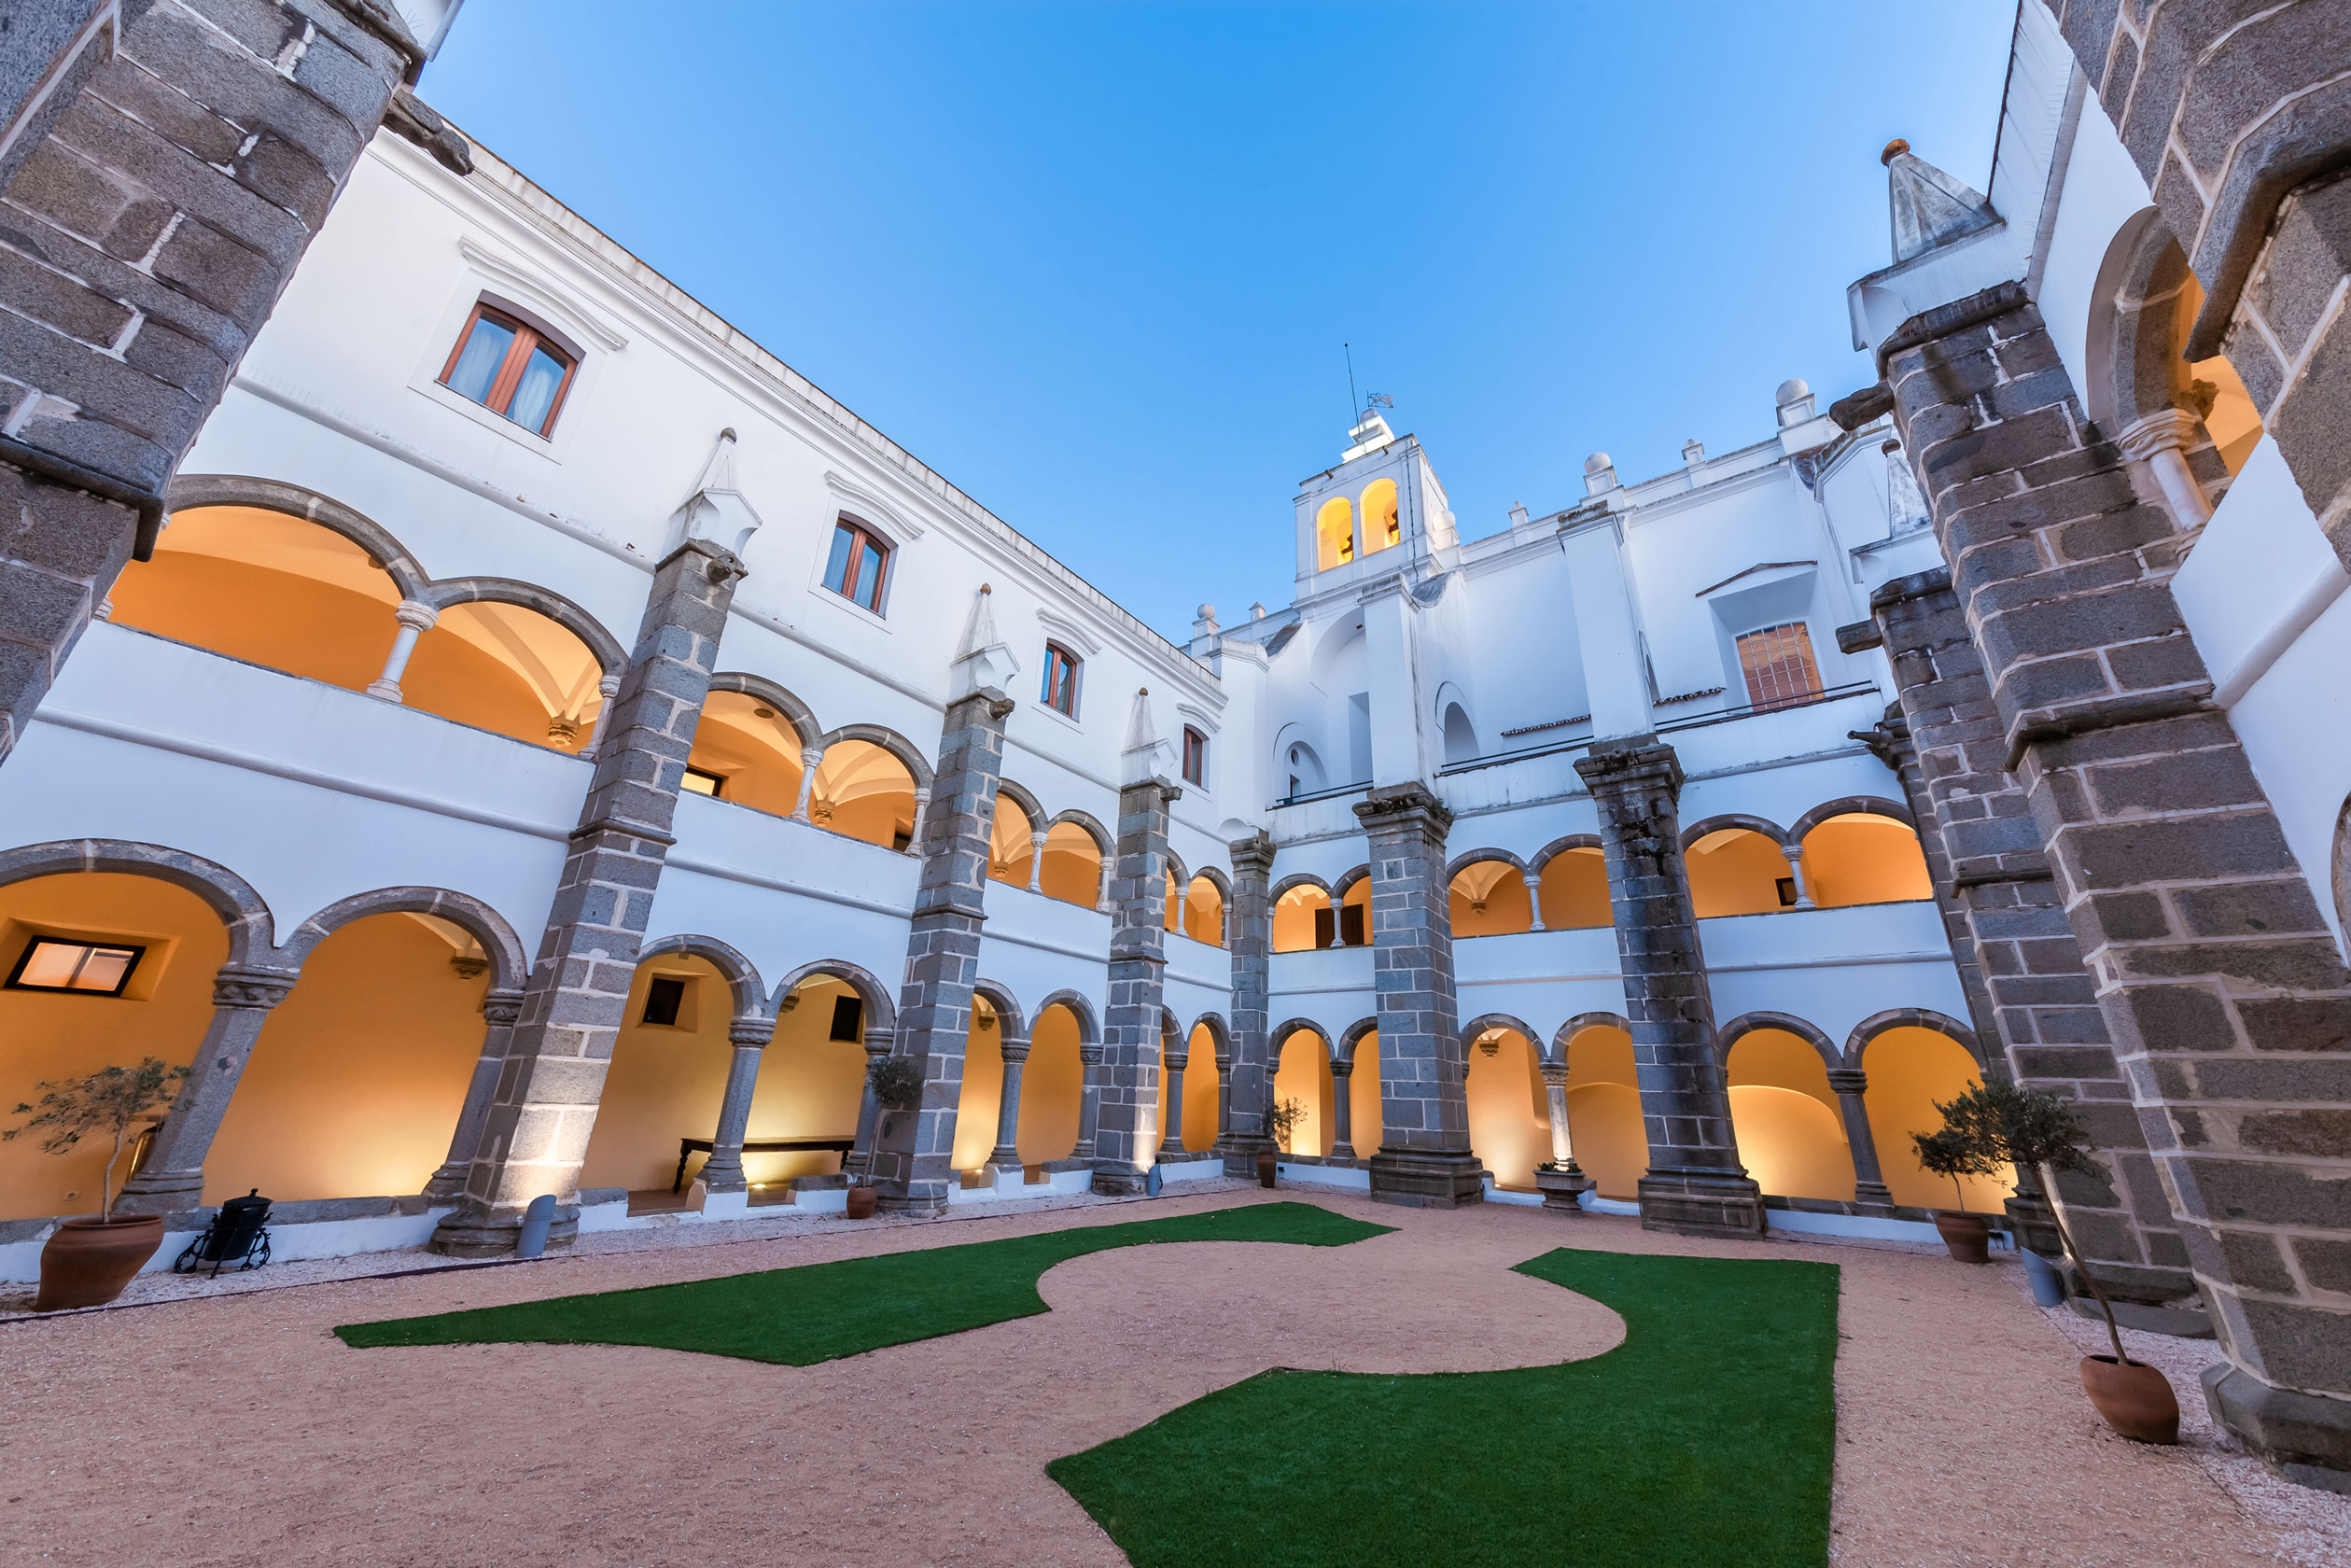 Convento do Espinheiro, Historic Hotel & Spa, Évora ©D.R.